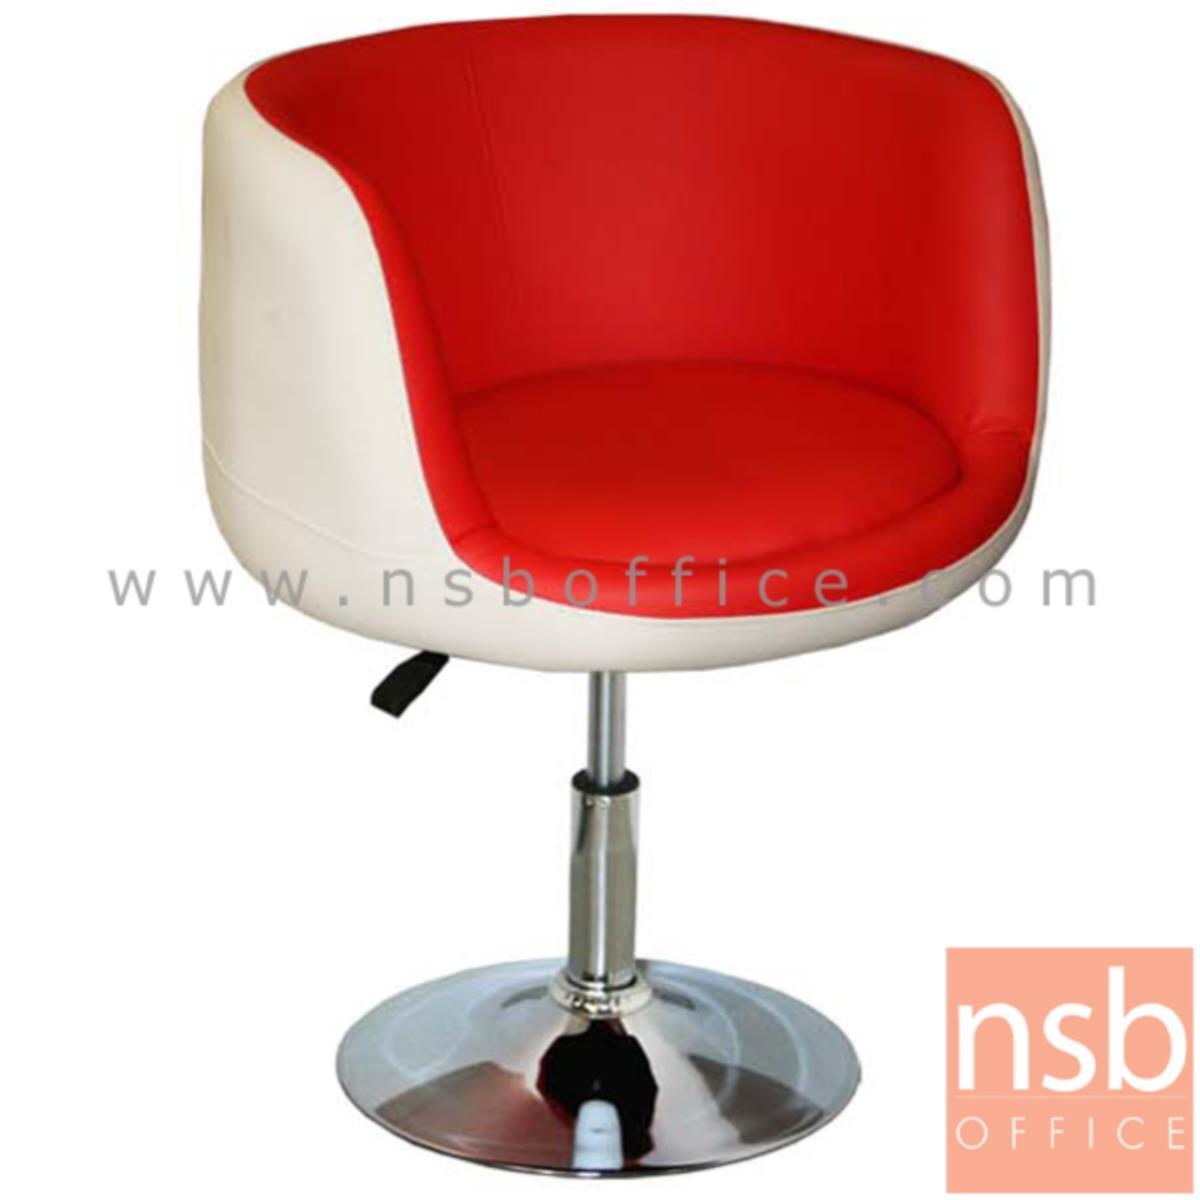 B22A042:เก้าอี้พักผ่อนหนังเทียมสีทูโทน รุ่น Uriah Heep (ยูไรอาห์ฮีป) ขนาด 65W cm. โช๊คแก๊ส โครงเหล็กชุบโครเมี่ยม